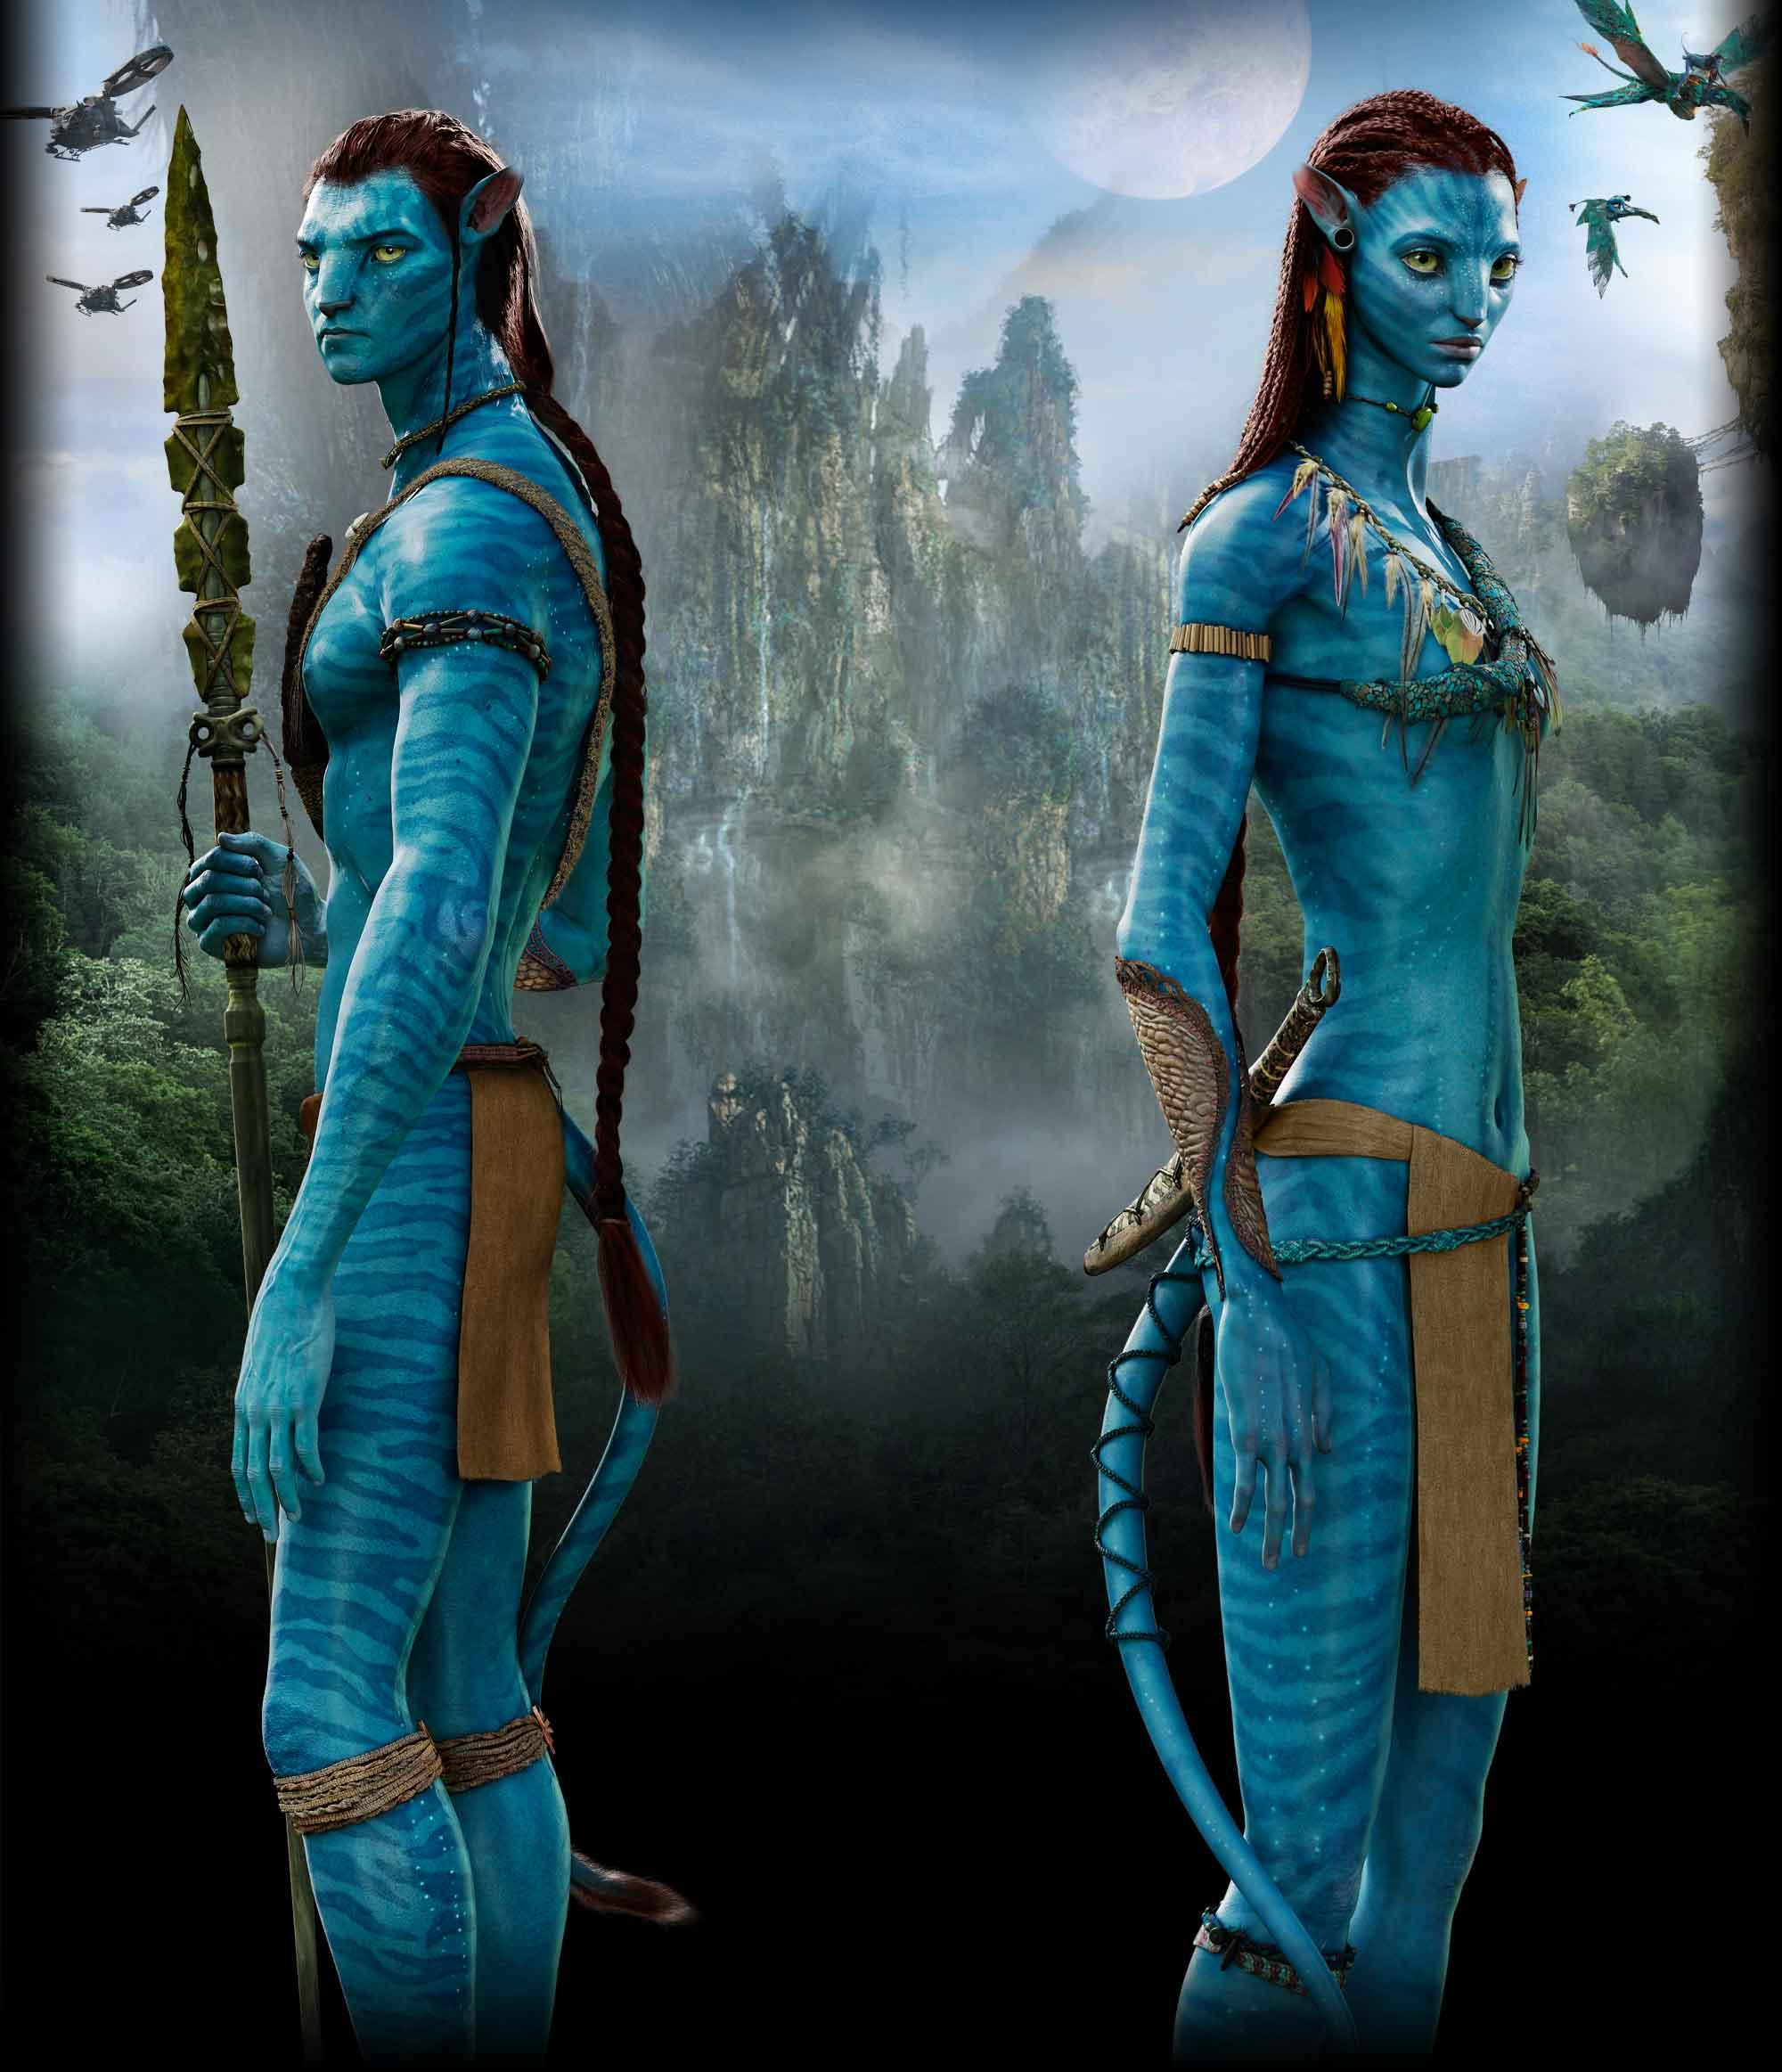 Avatar Navi Gay Porn jake sully and neytiri | www.freeepornz